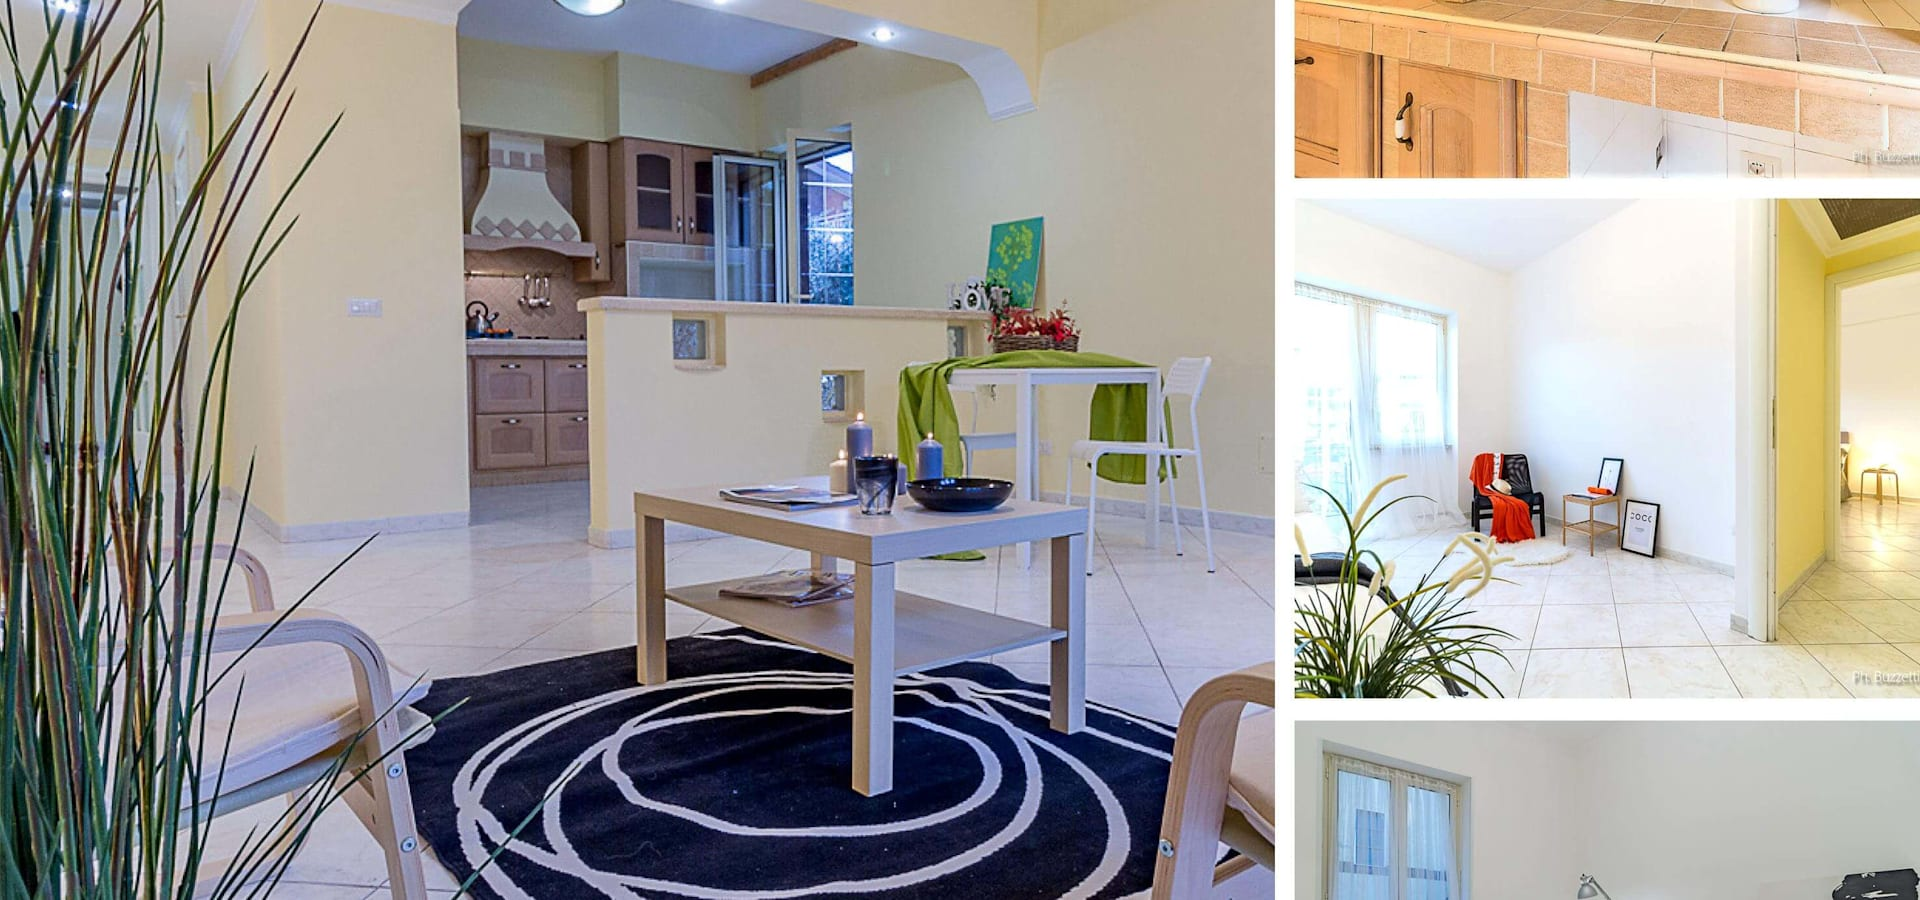 DEDA Architettura Design – Architettura e Home Staging